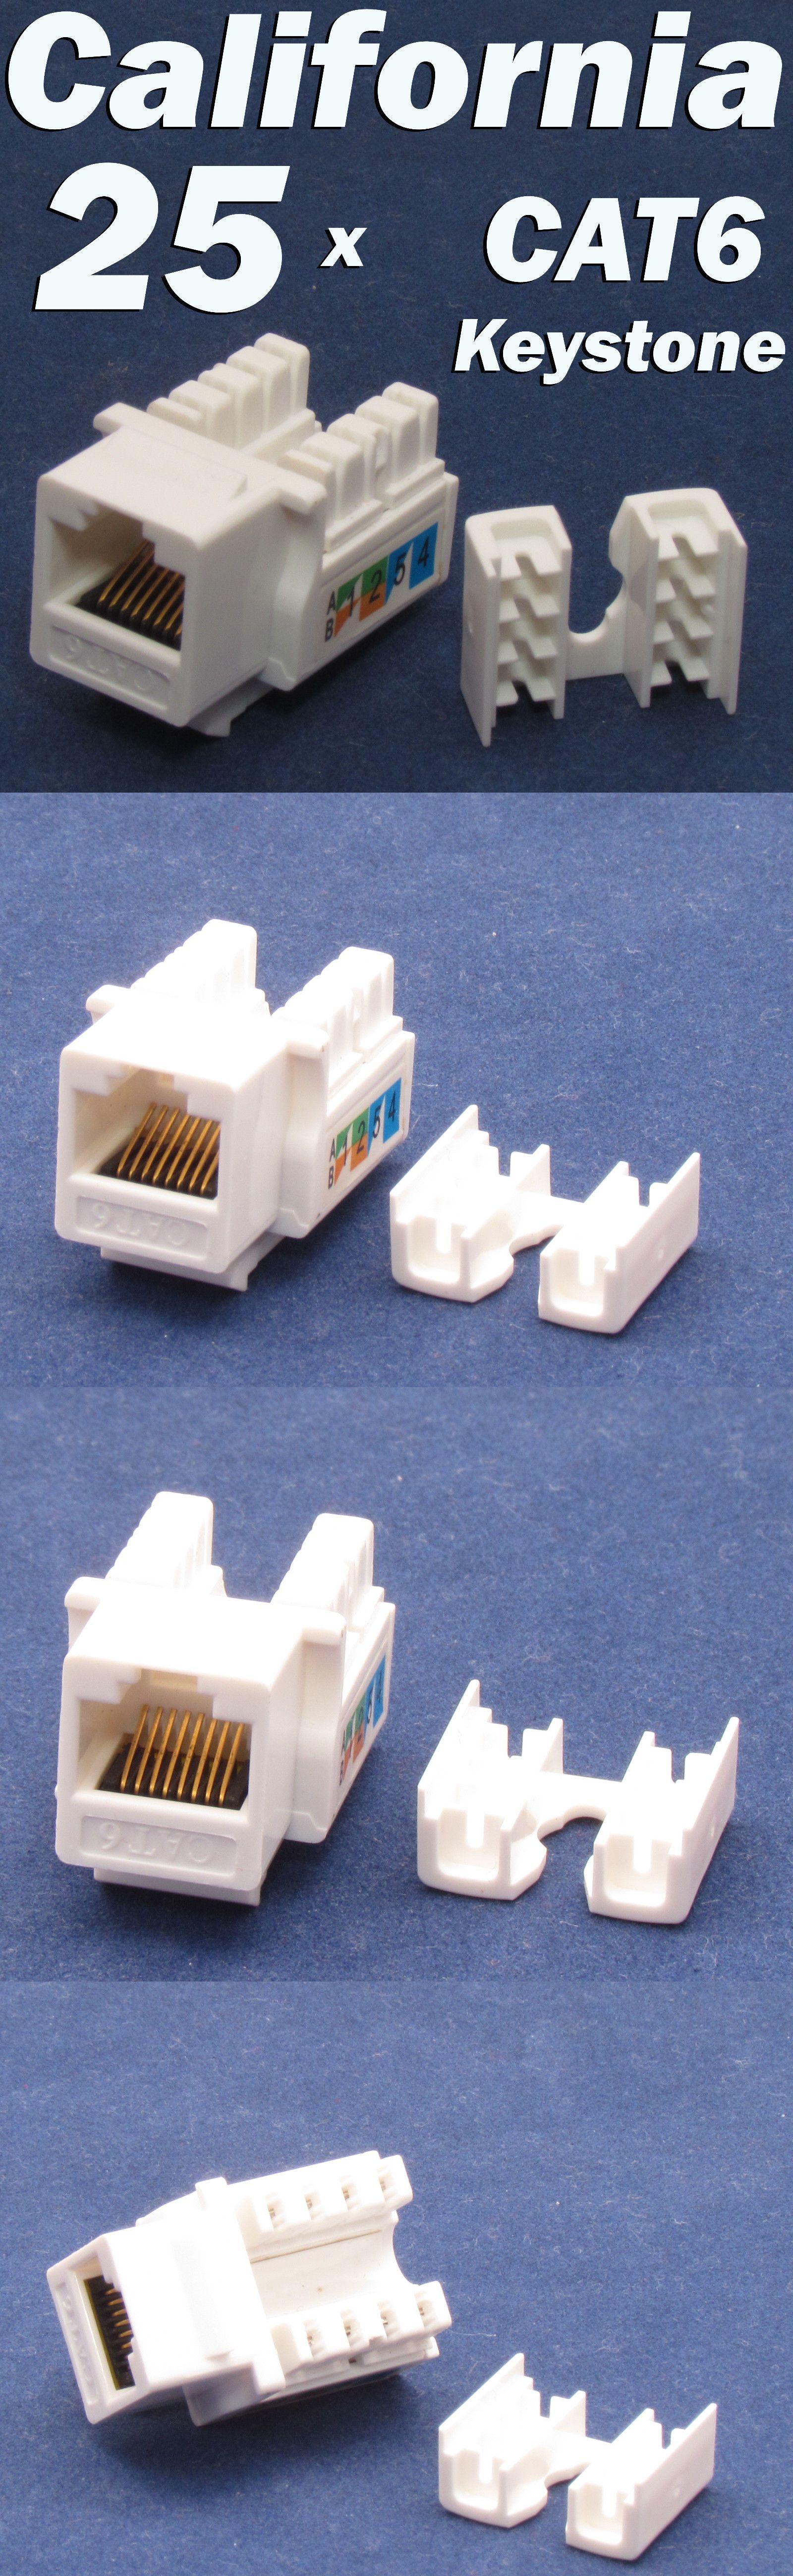 25 X Pcs Lot Keystone Jack Cat6 White Network Ethernet 110 Punch Down 8p8c Rj45 Plates On Wall Wall Jack Plates